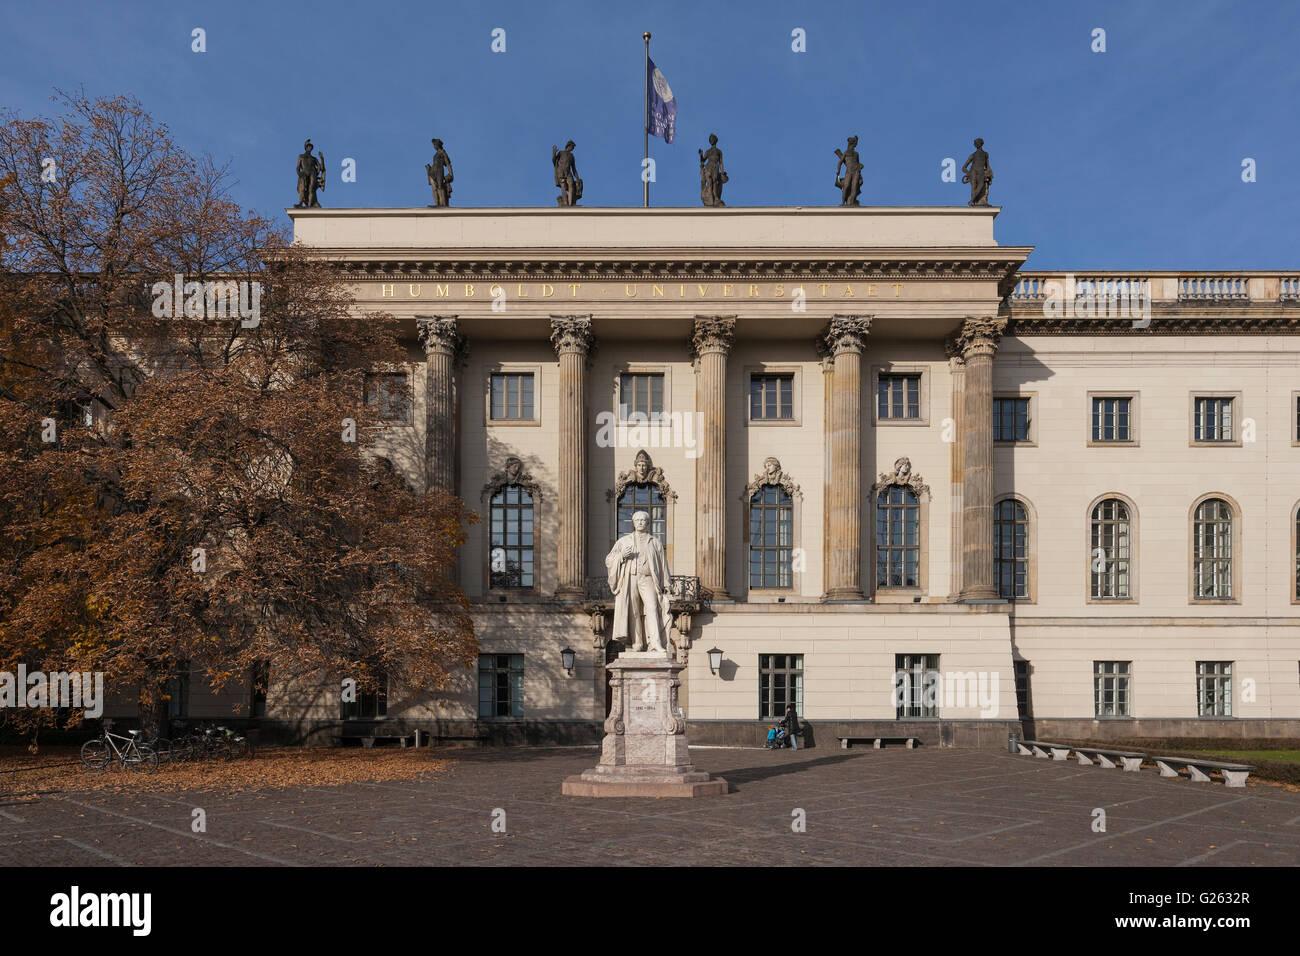 Alexander von Humboldt statue outside the main building of Humboldt-Universität zu Berlin, Unter den Linden - Stock Image